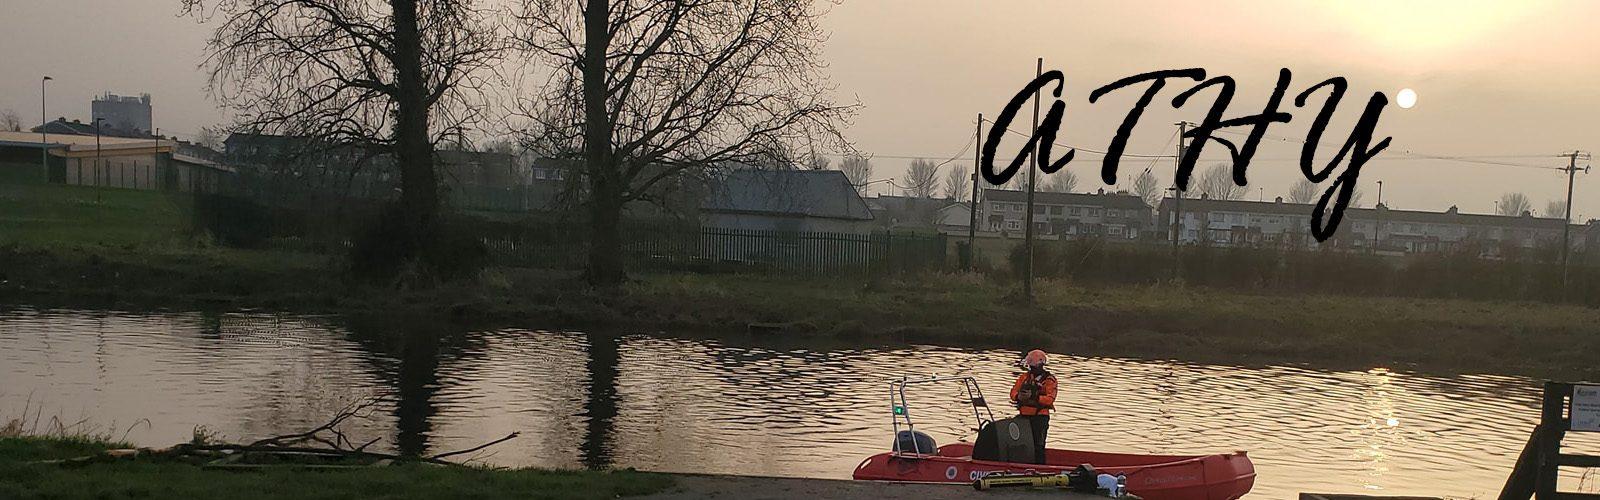 Athy Ireland Community News